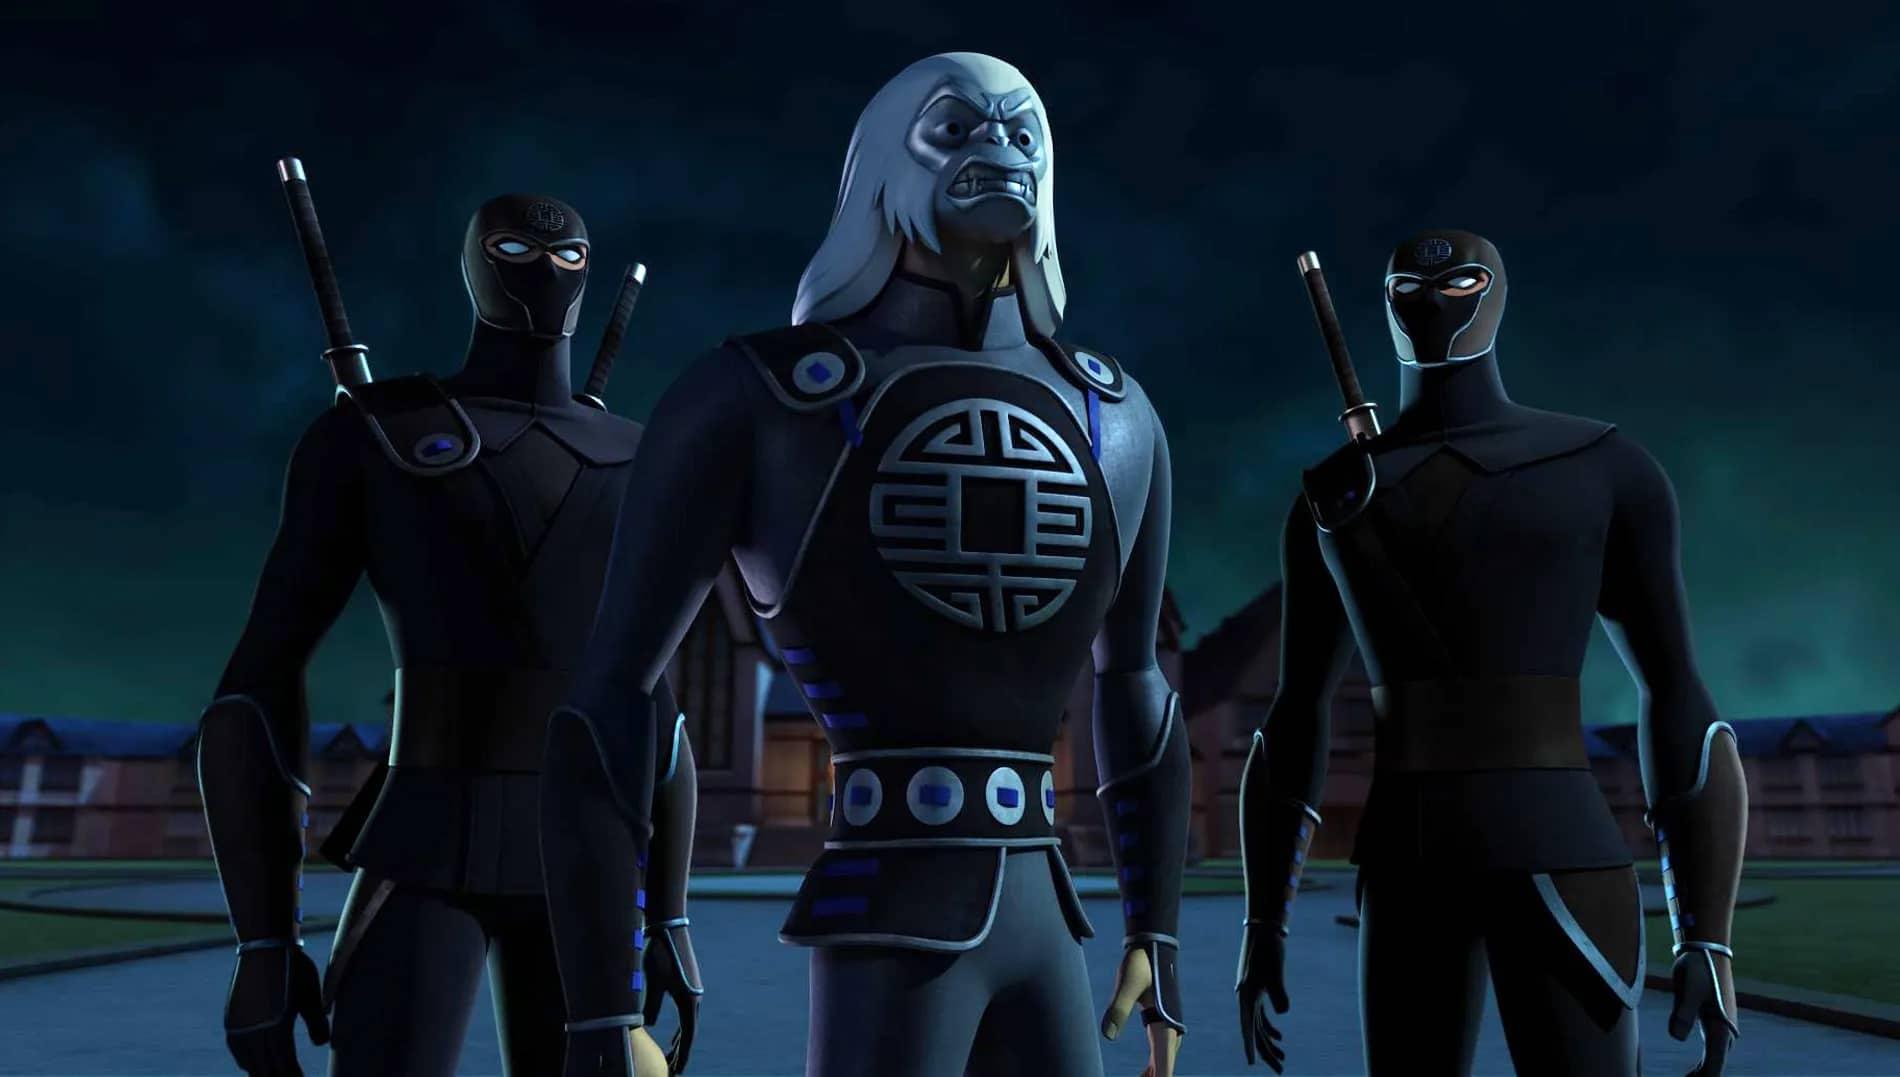 beware the batman hbo max 3d animated series DC Comics tv show